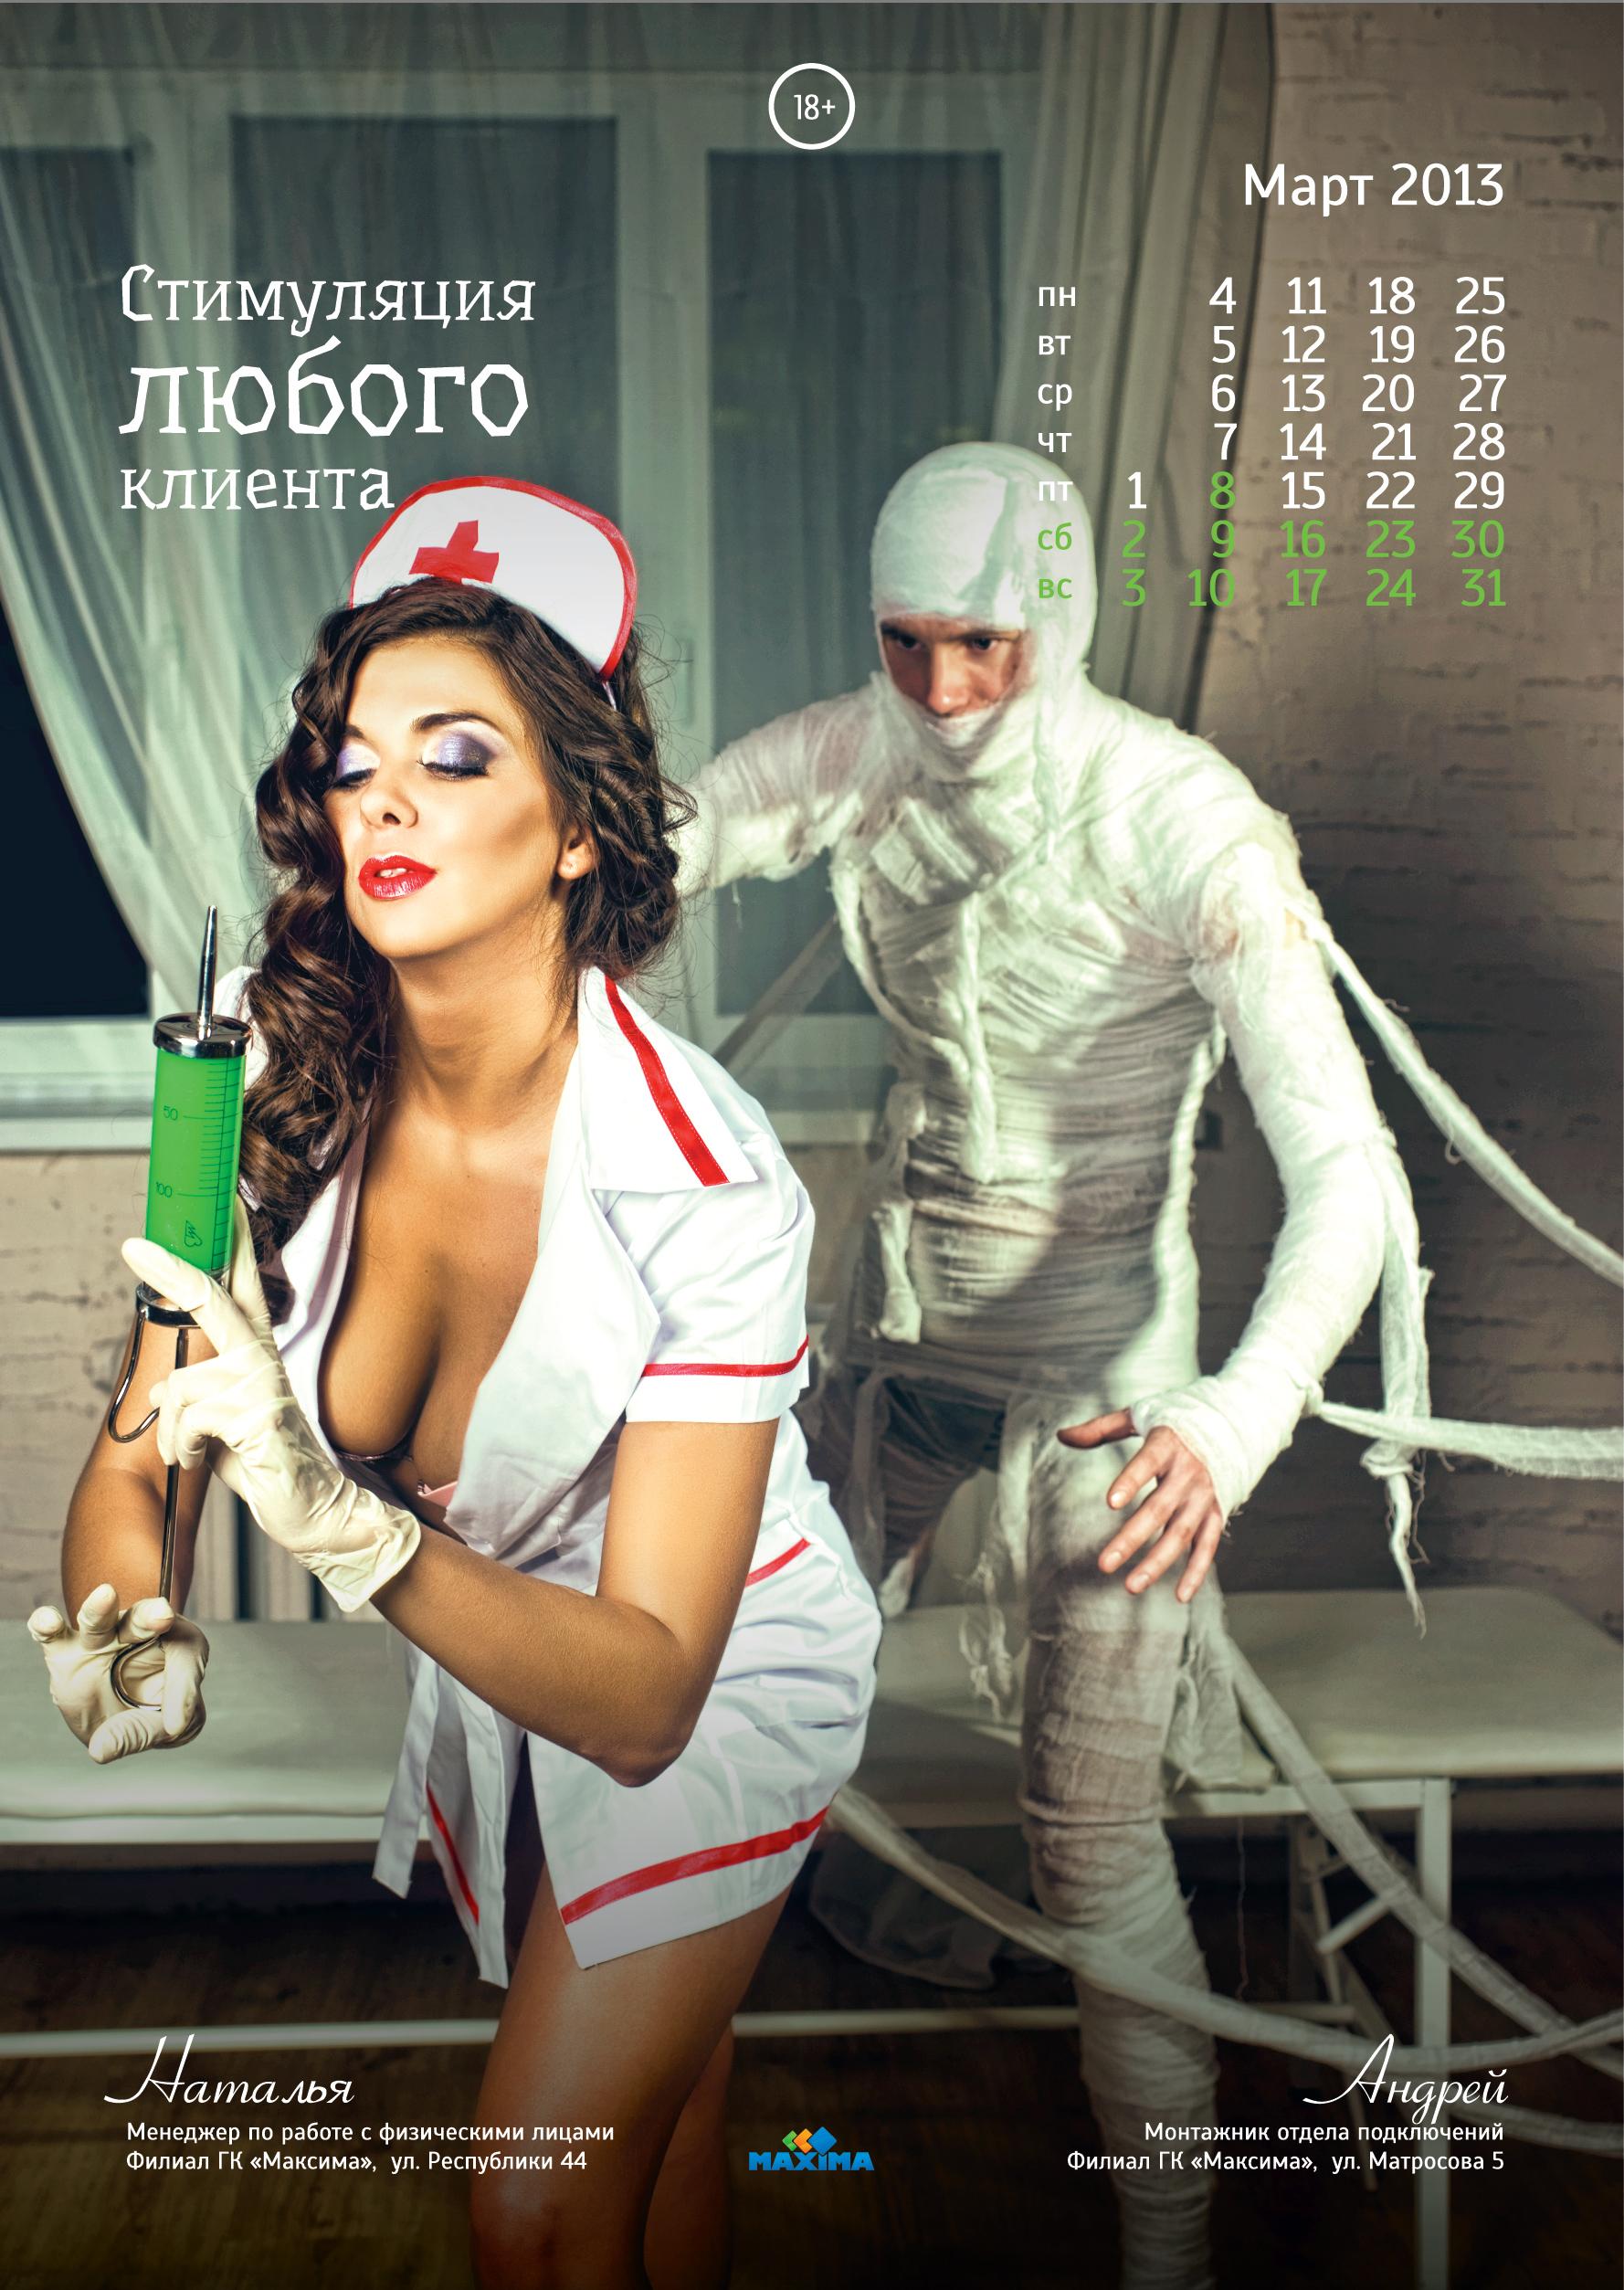 eroticheskie-kalendari-kompaniy